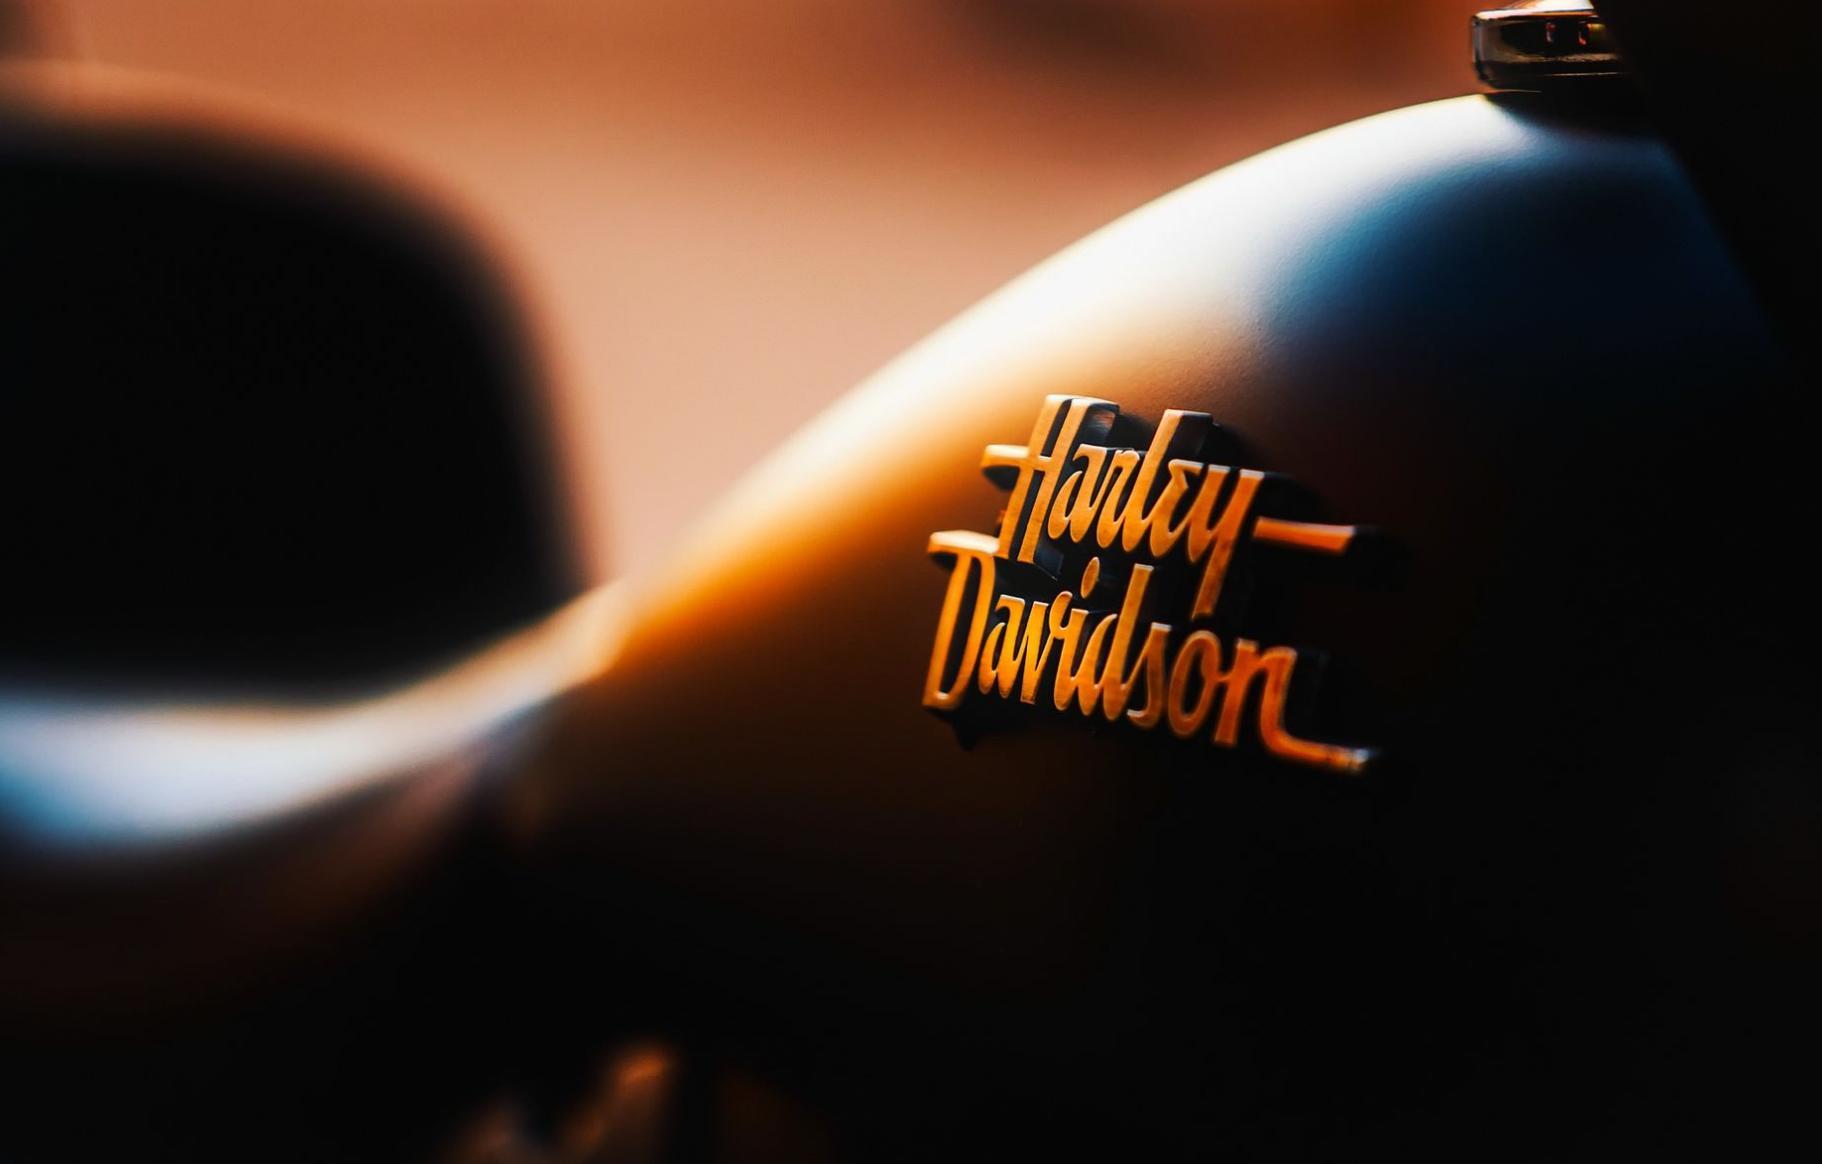 Harley-Davidson logo vector free download